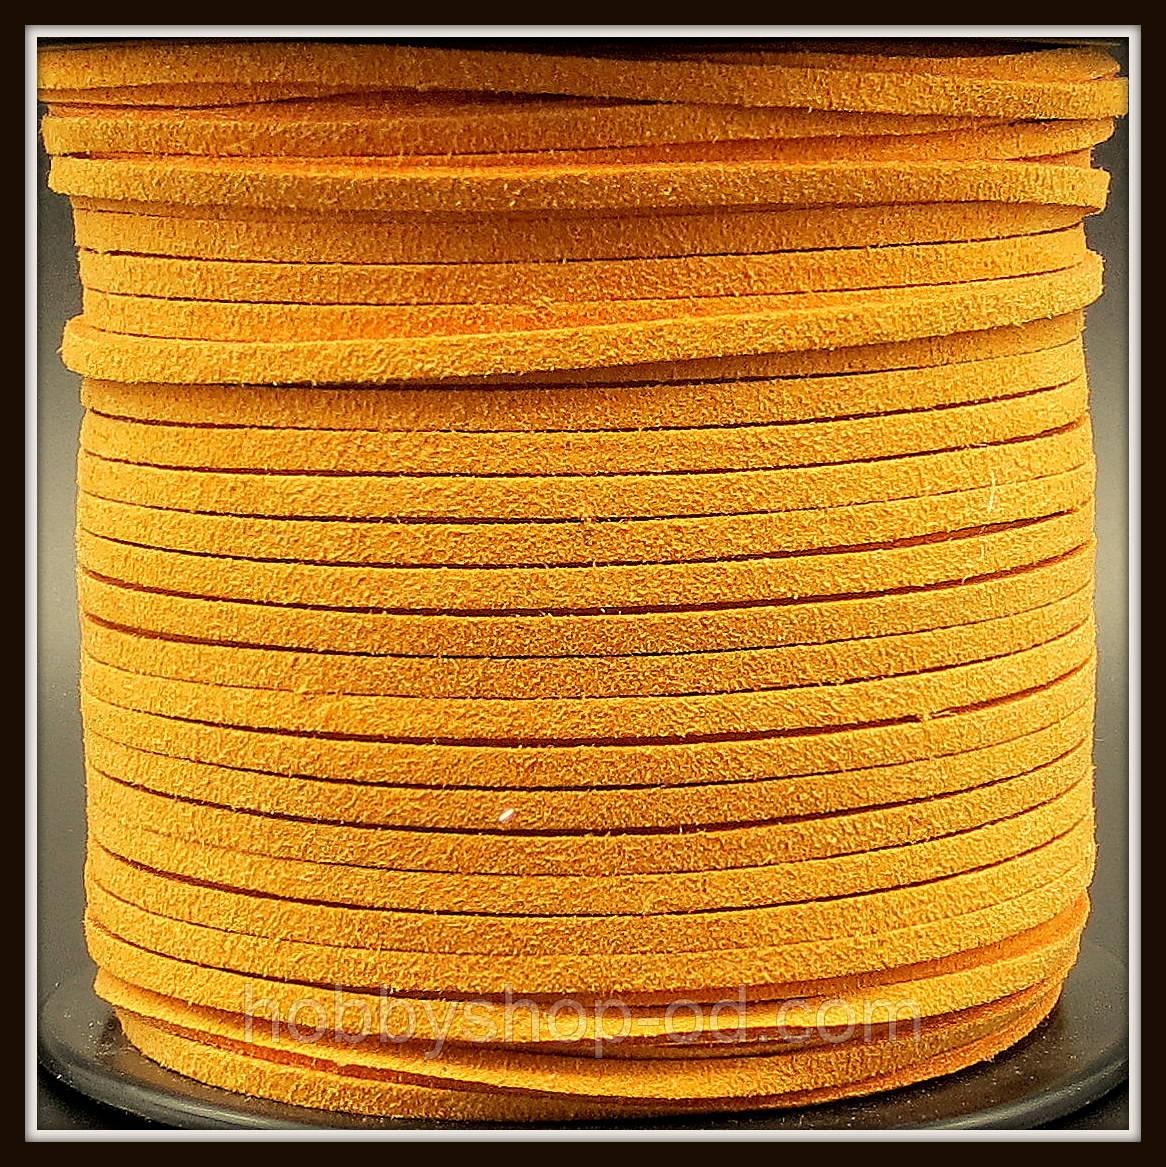 Шнур замшевый 3 мм, цвет тыквенный